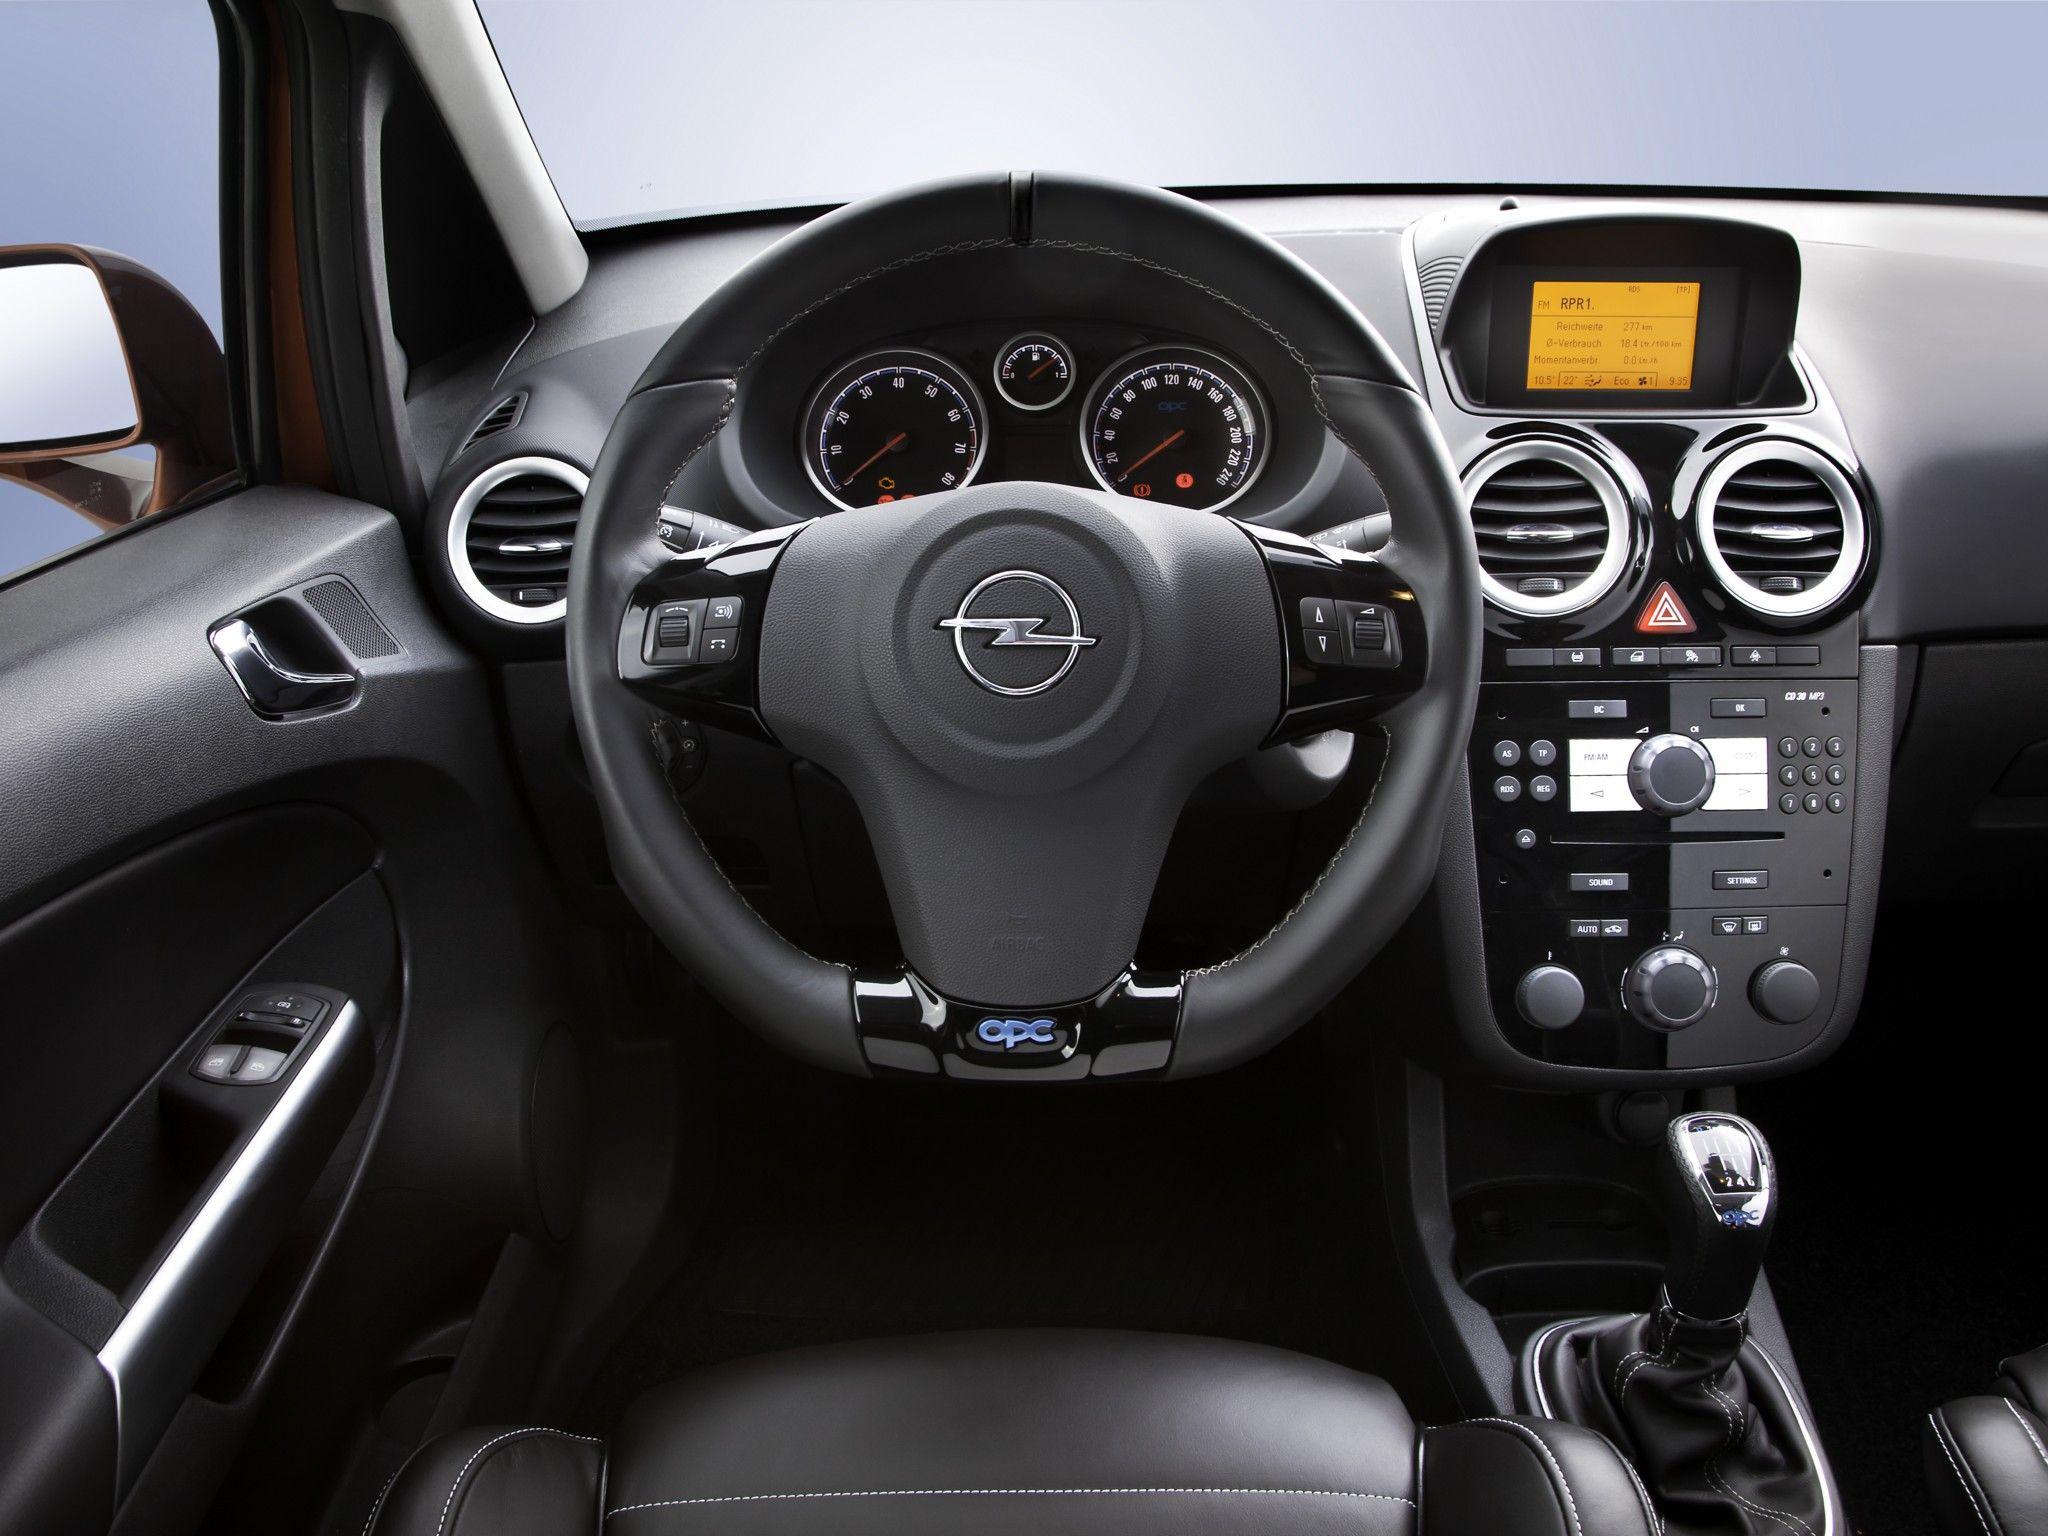 Opel Corsa Opc Nurburgring Edition D 2011